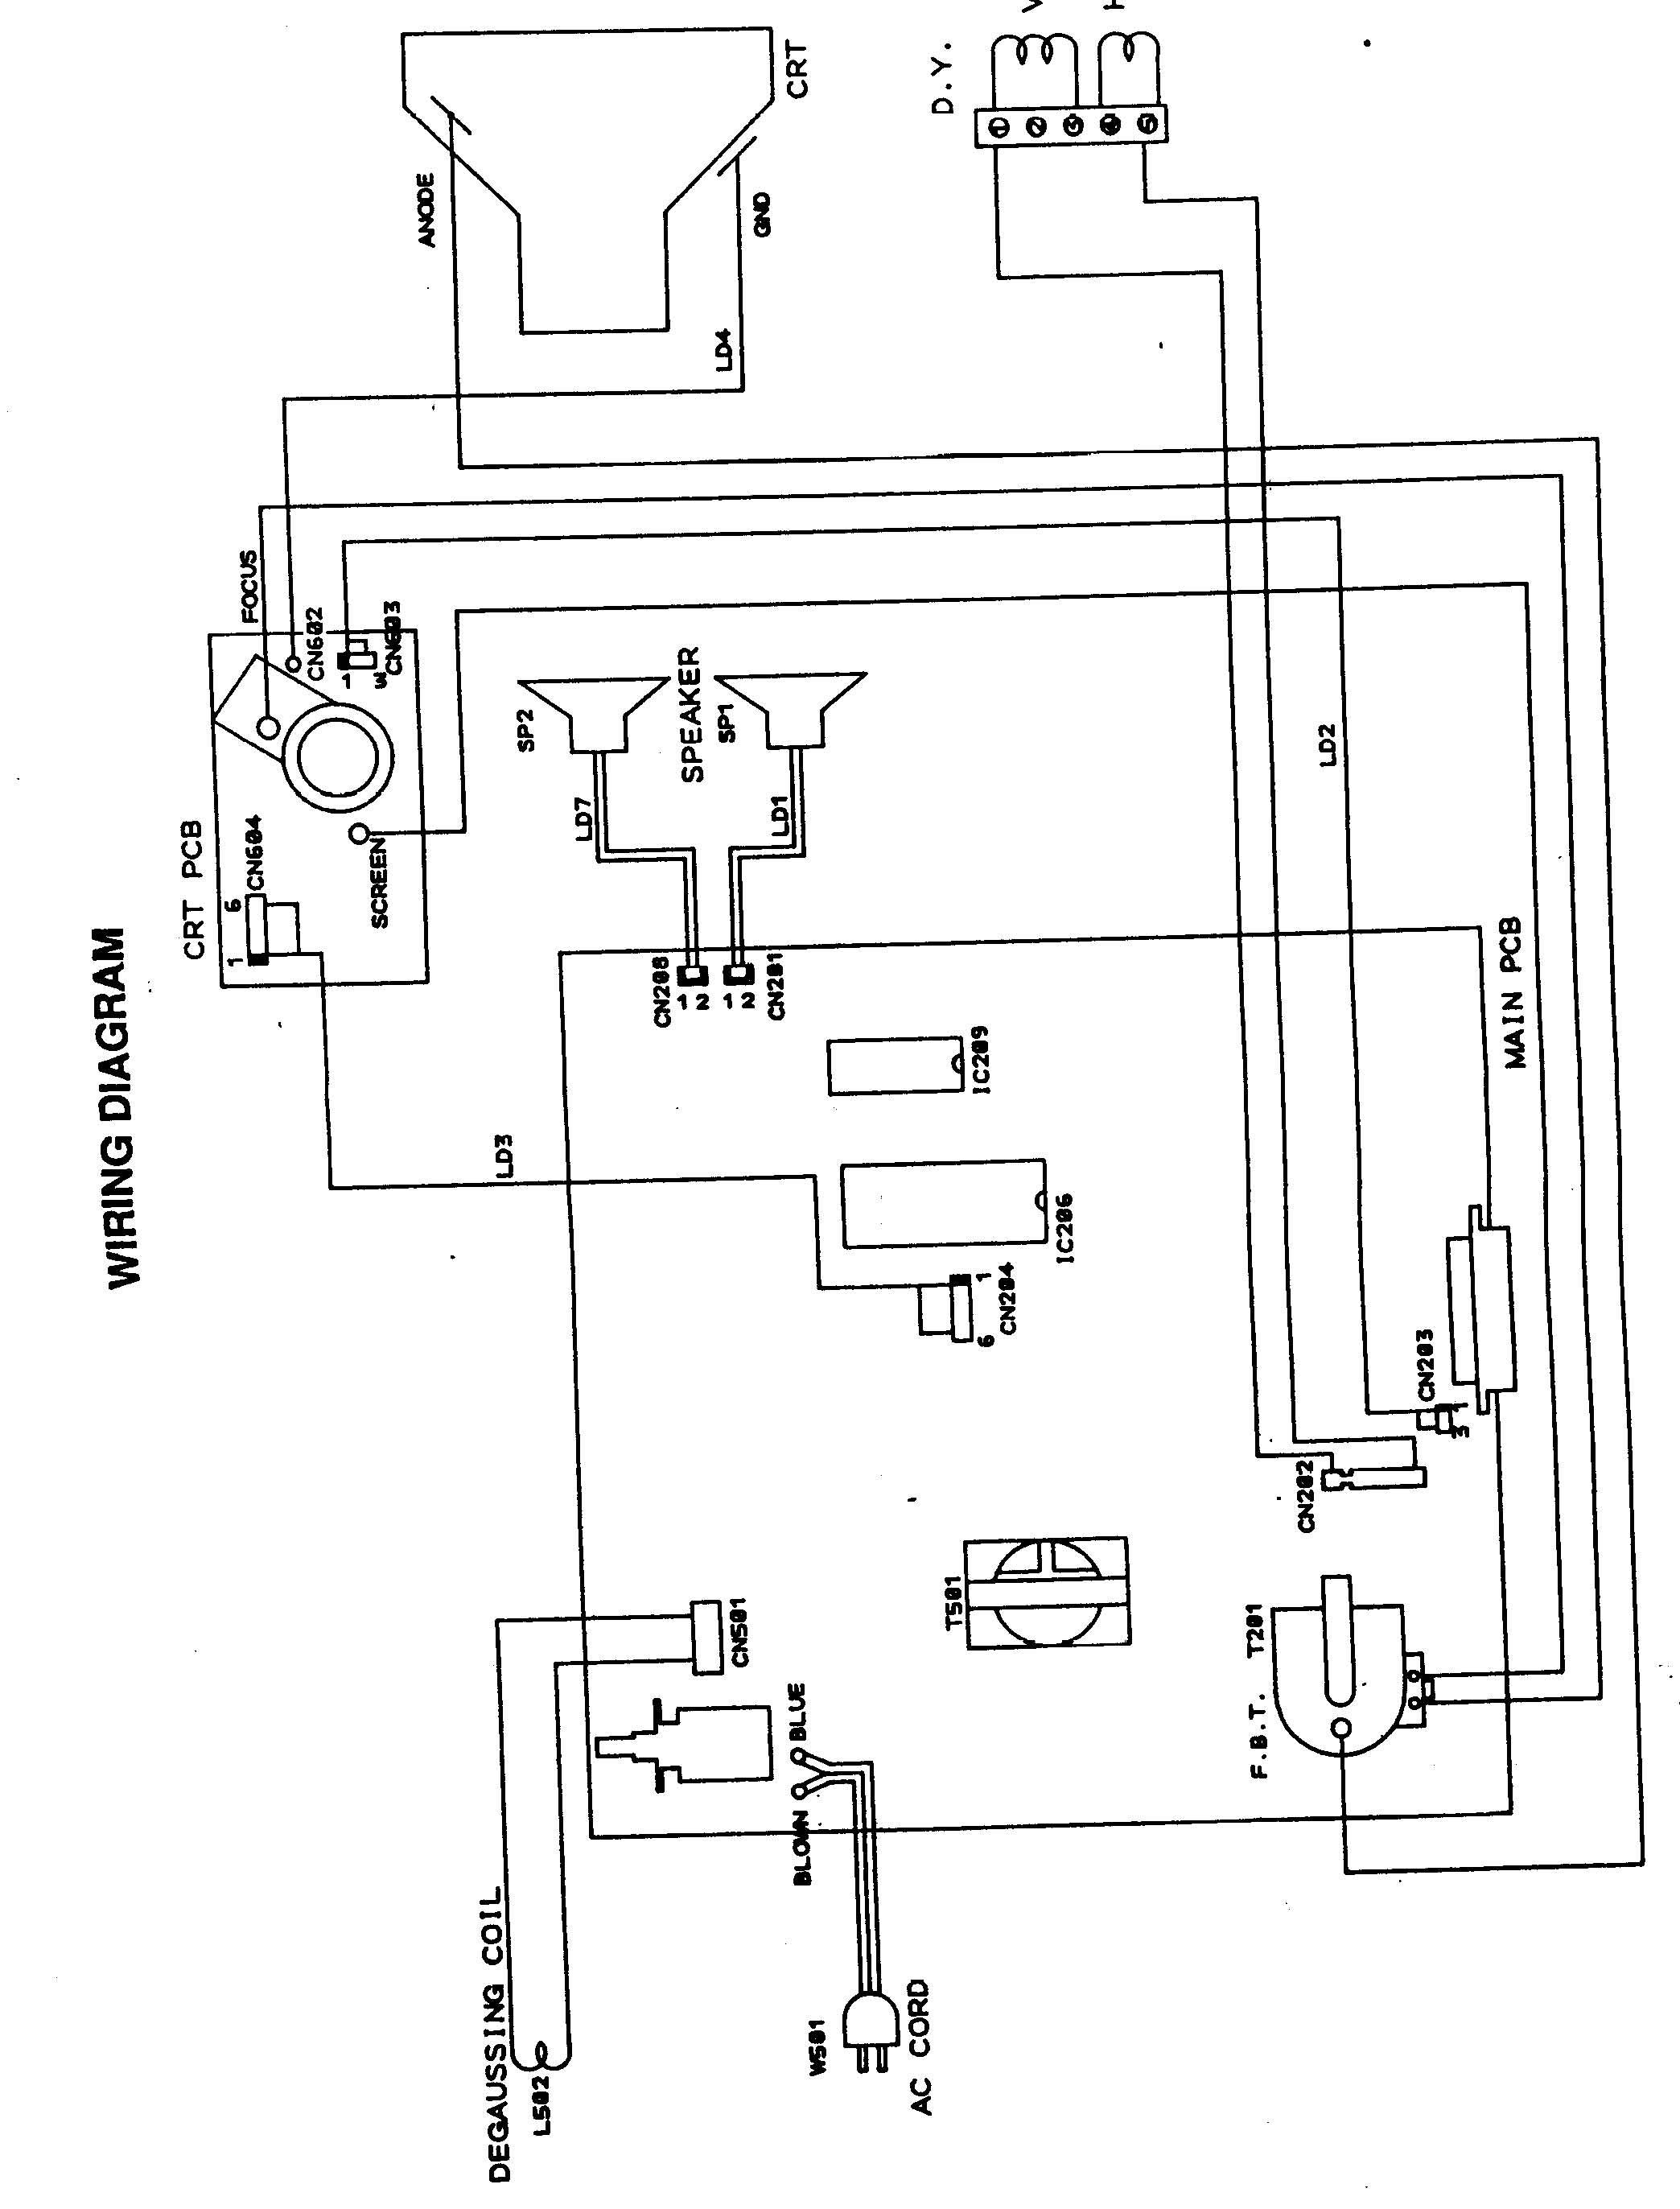 funai 2000 mk 7 schematic diagram in pdf format e. Black Bedroom Furniture Sets. Home Design Ideas